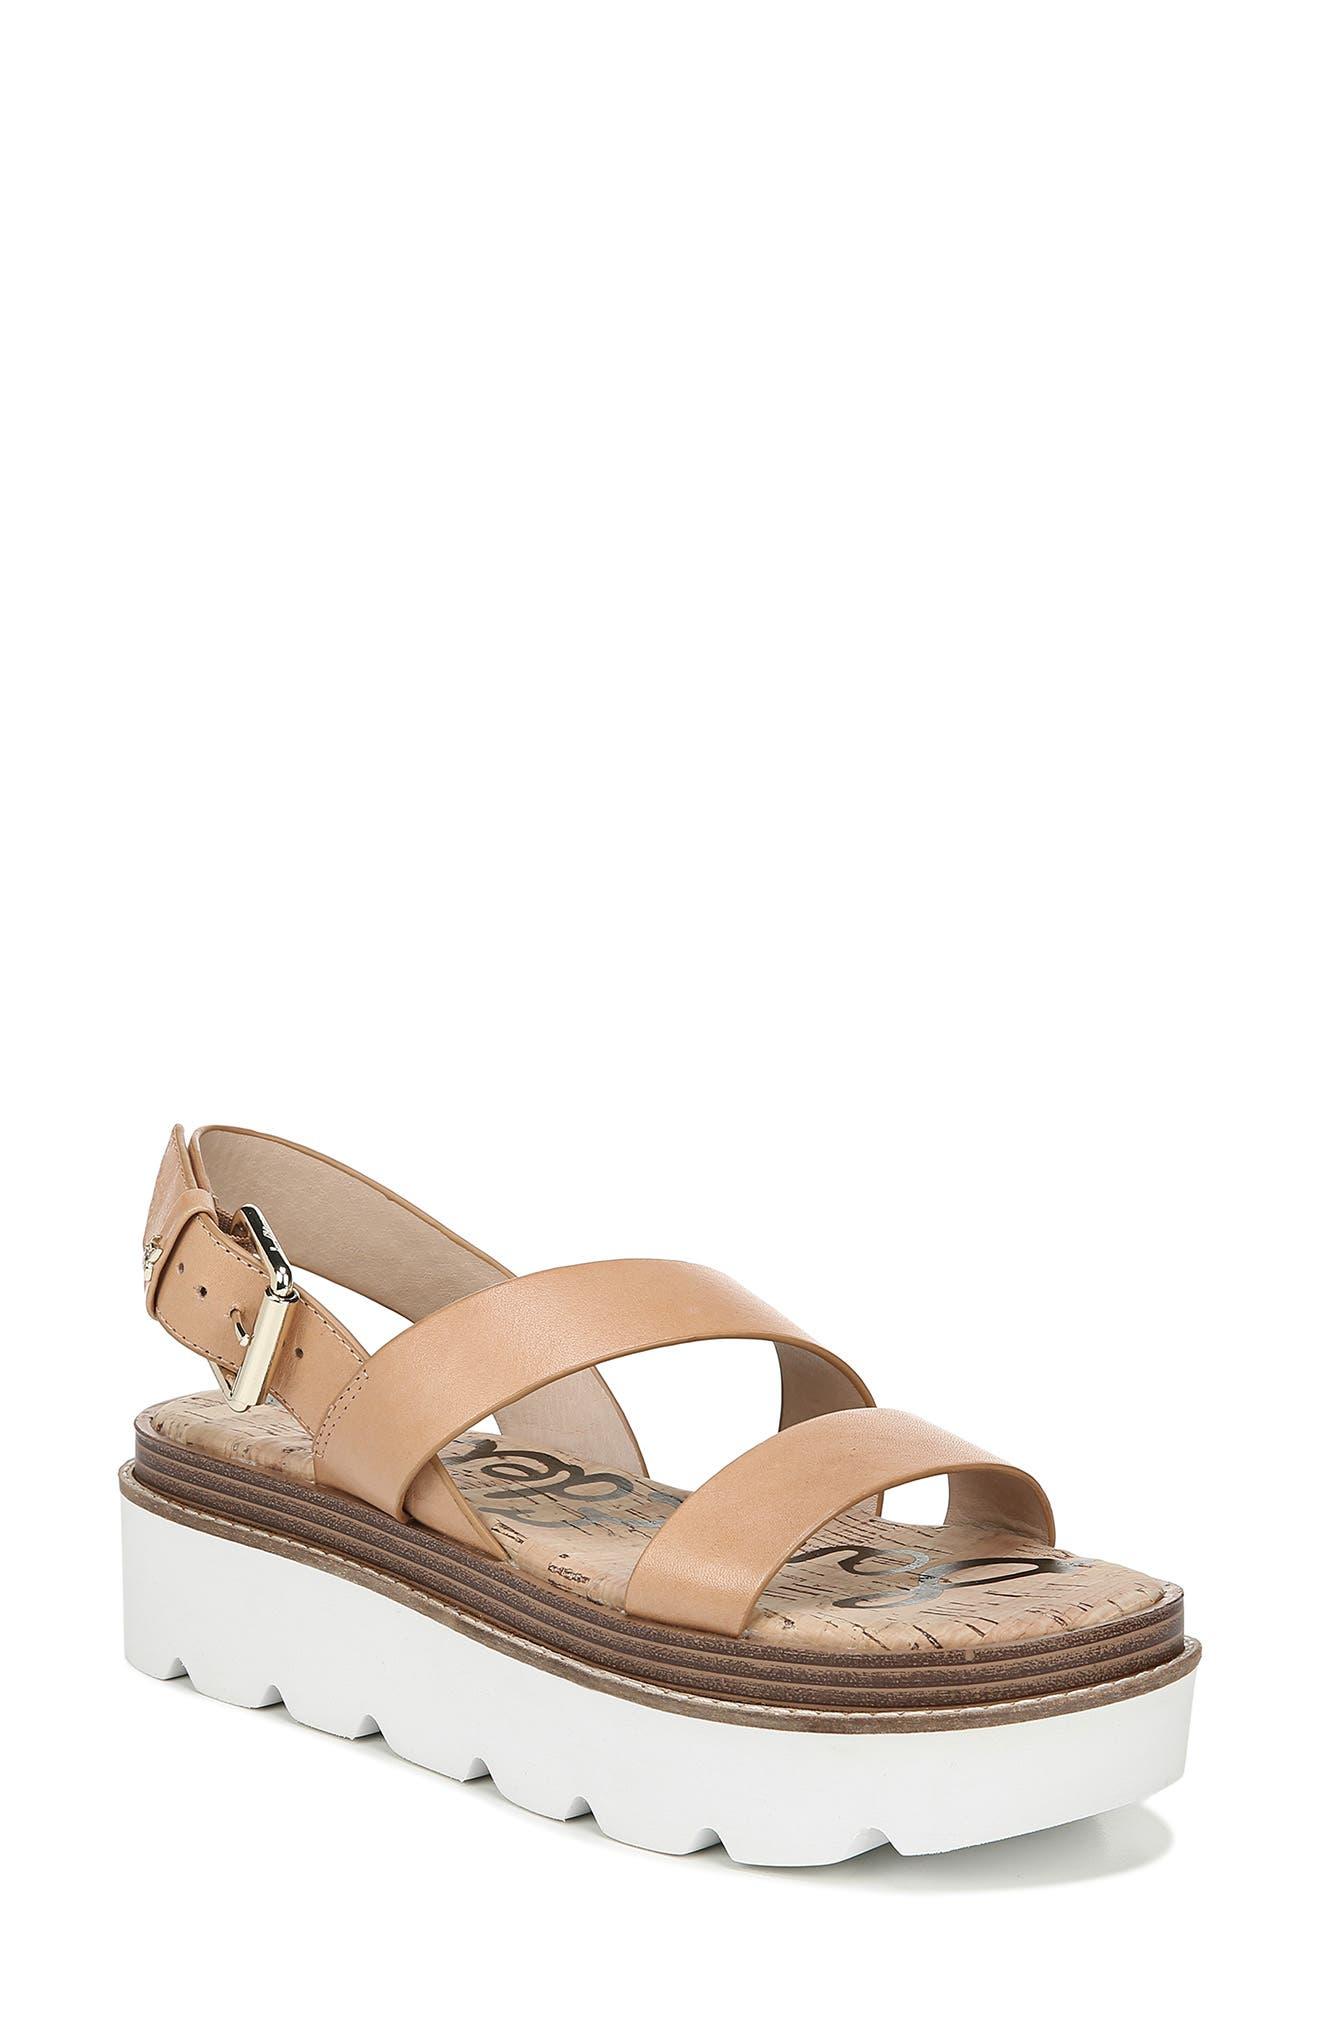 Sam Edelman Rasheed Slingback Platform Sandal, Brown